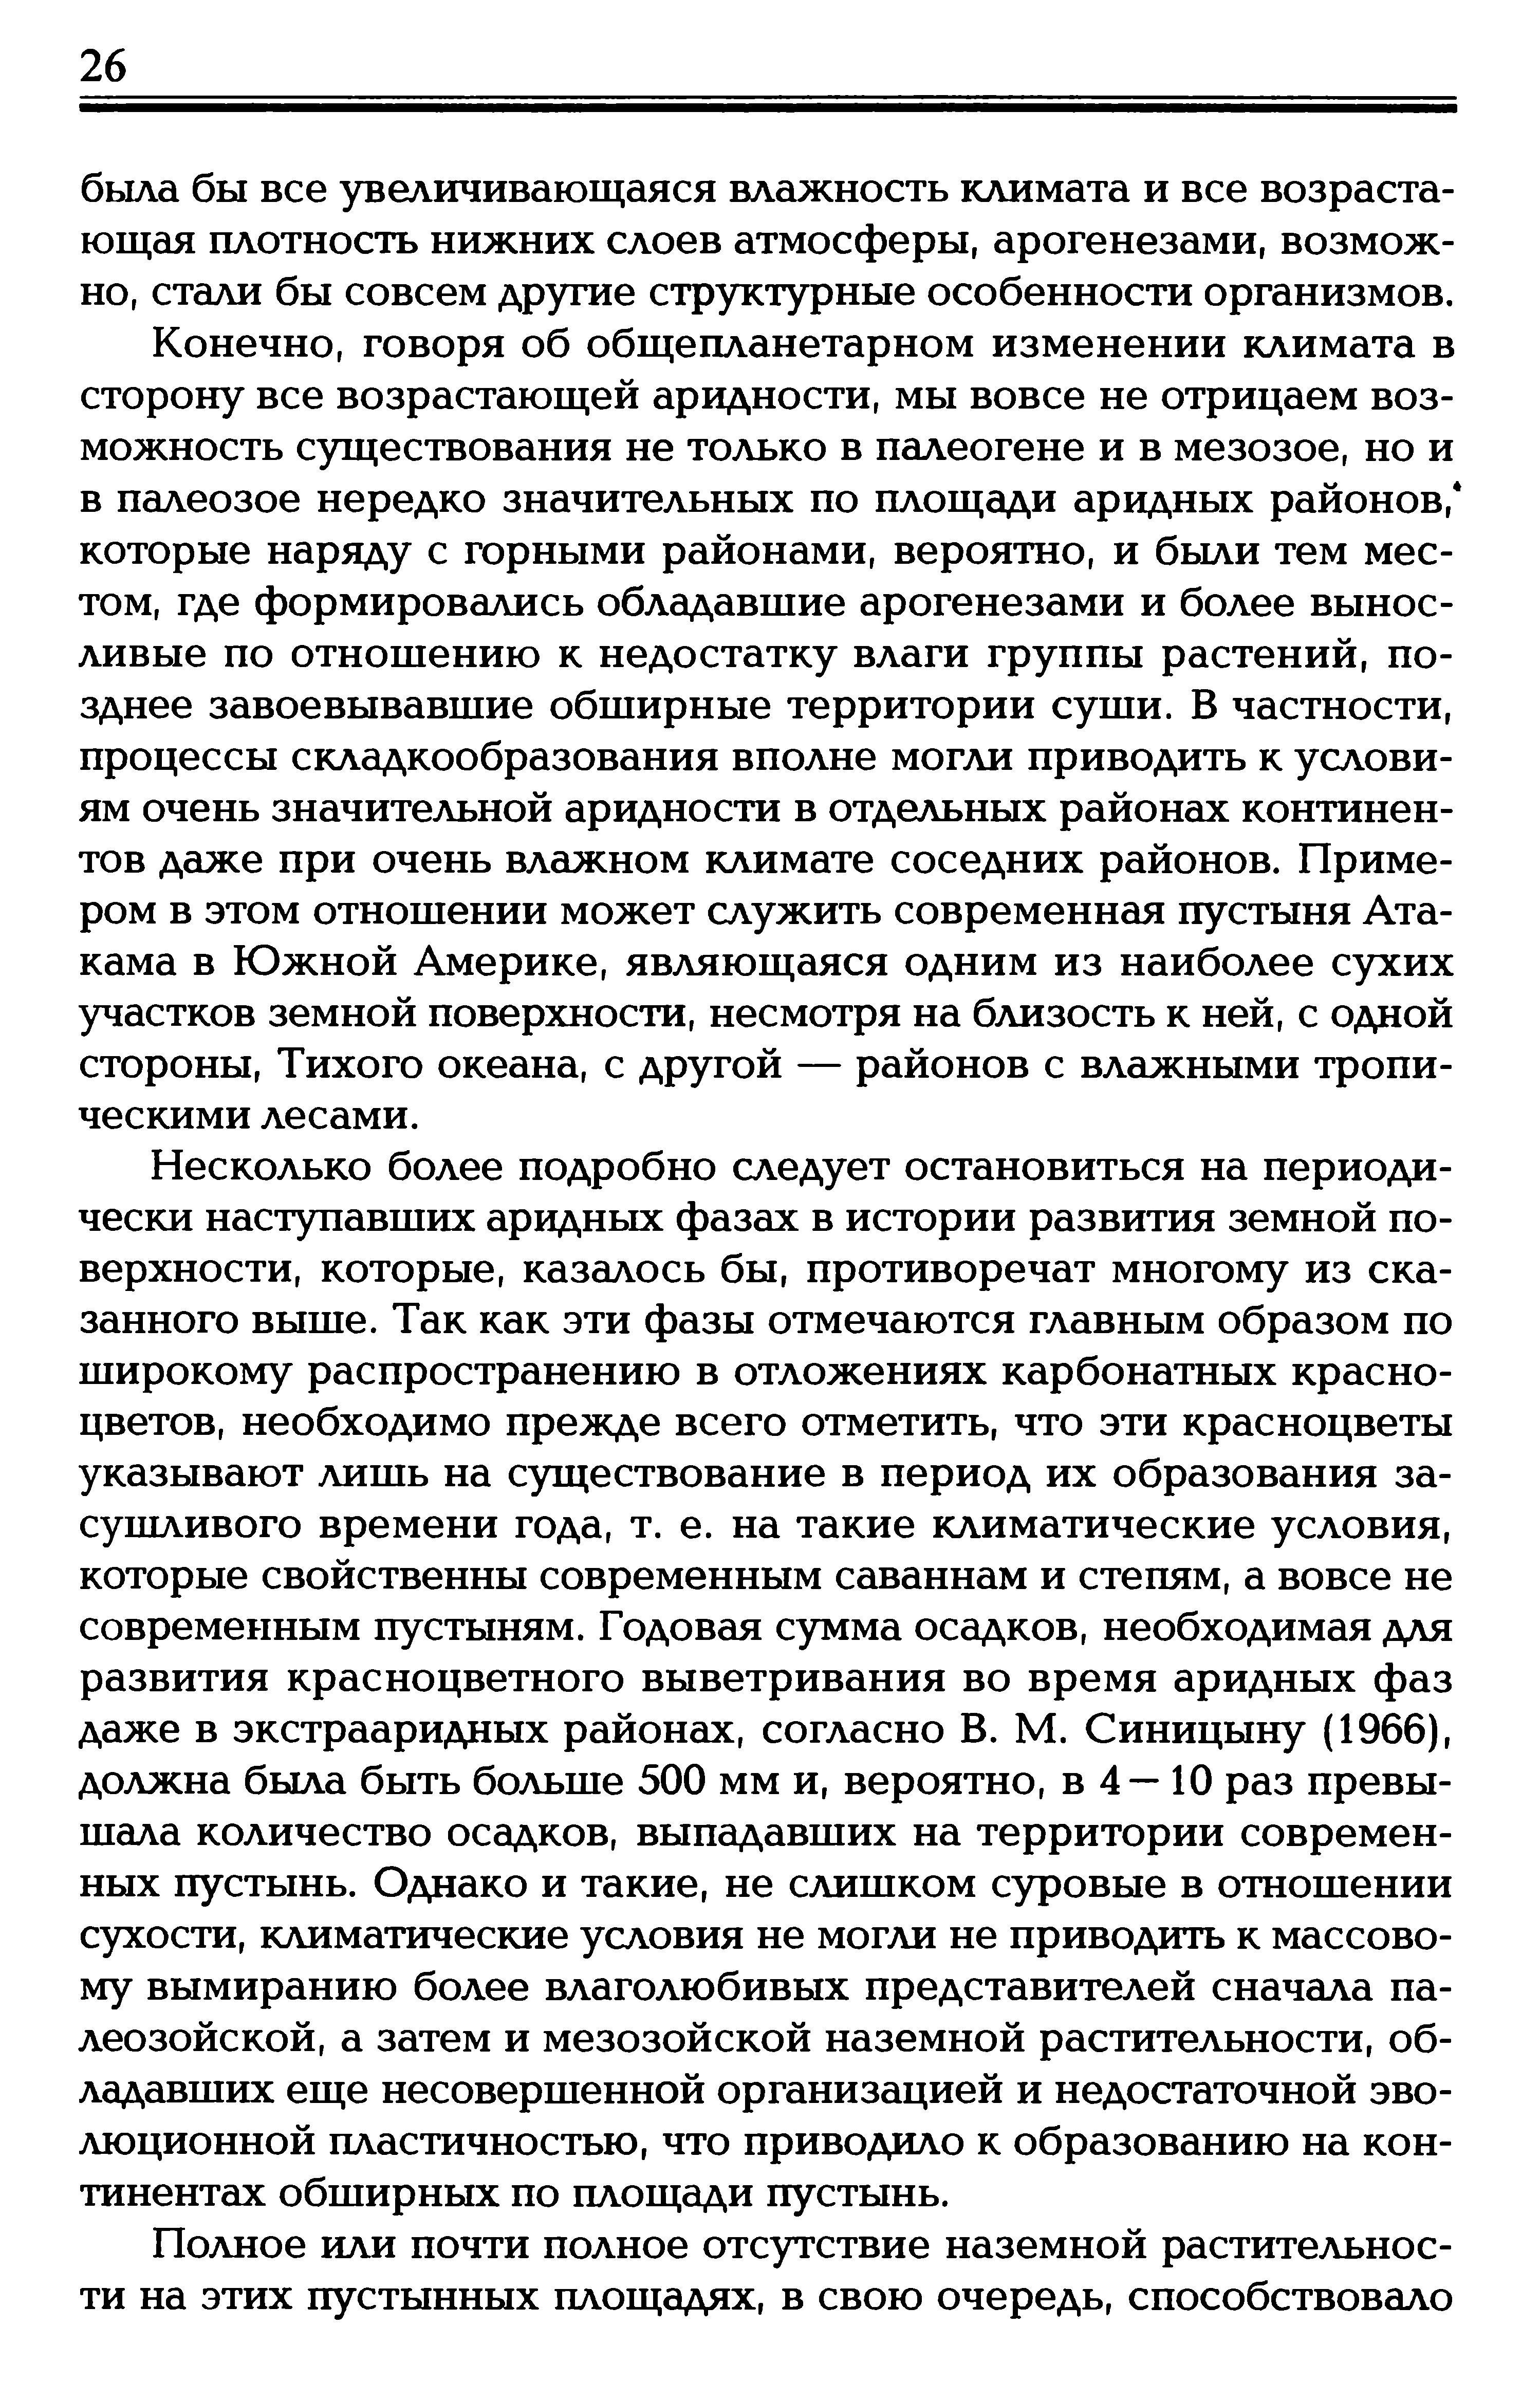 Tzvelev, 2005_1_07.jpeg